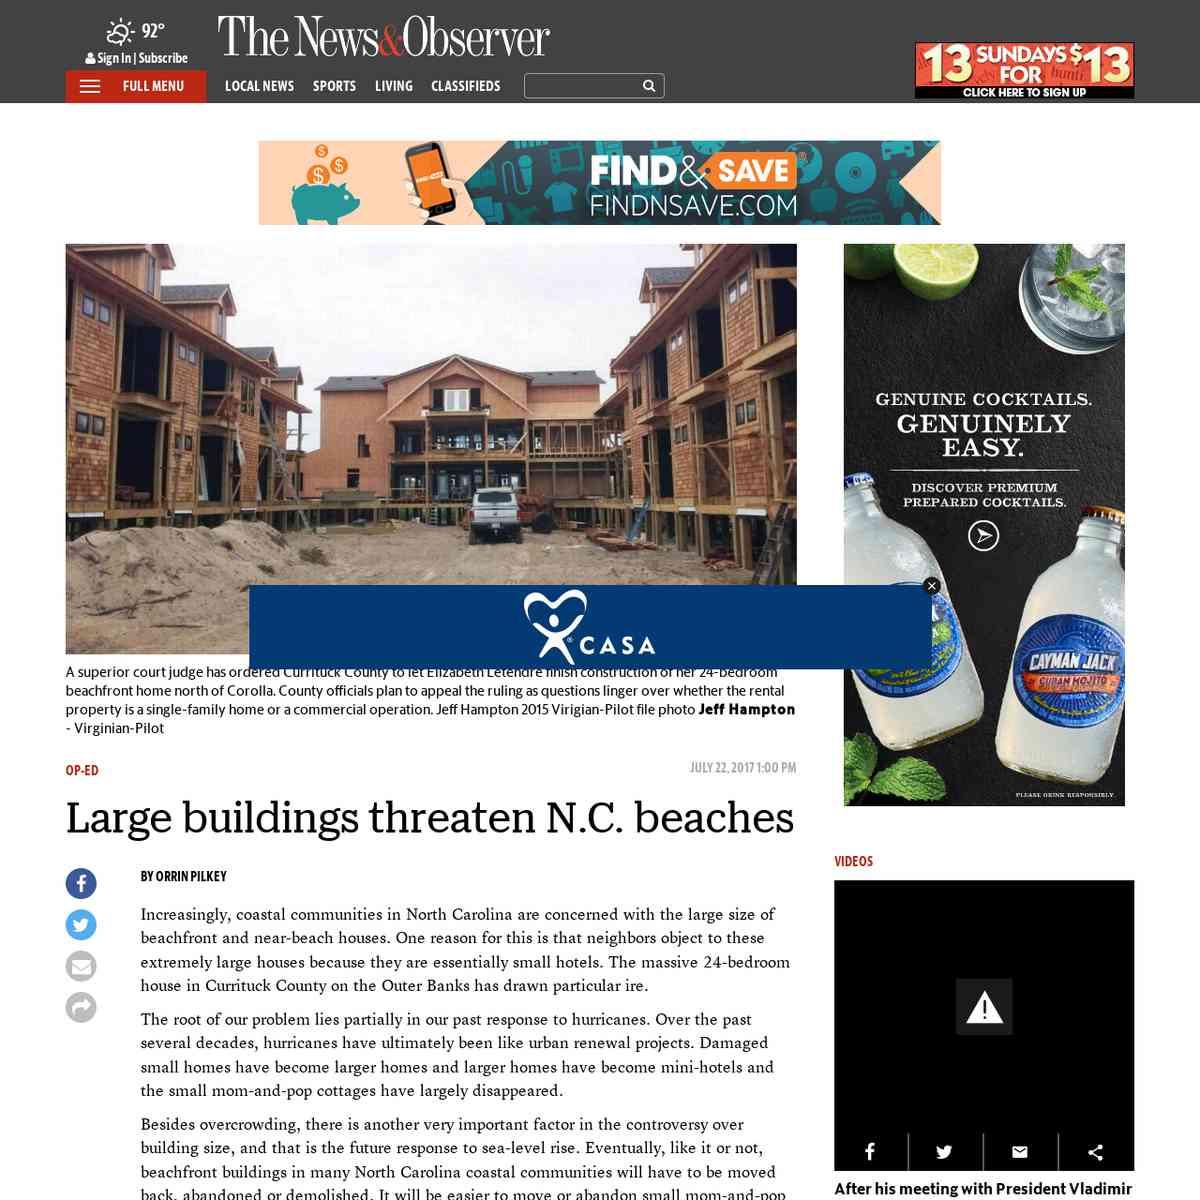 Large buildings threaten N.C. beaches